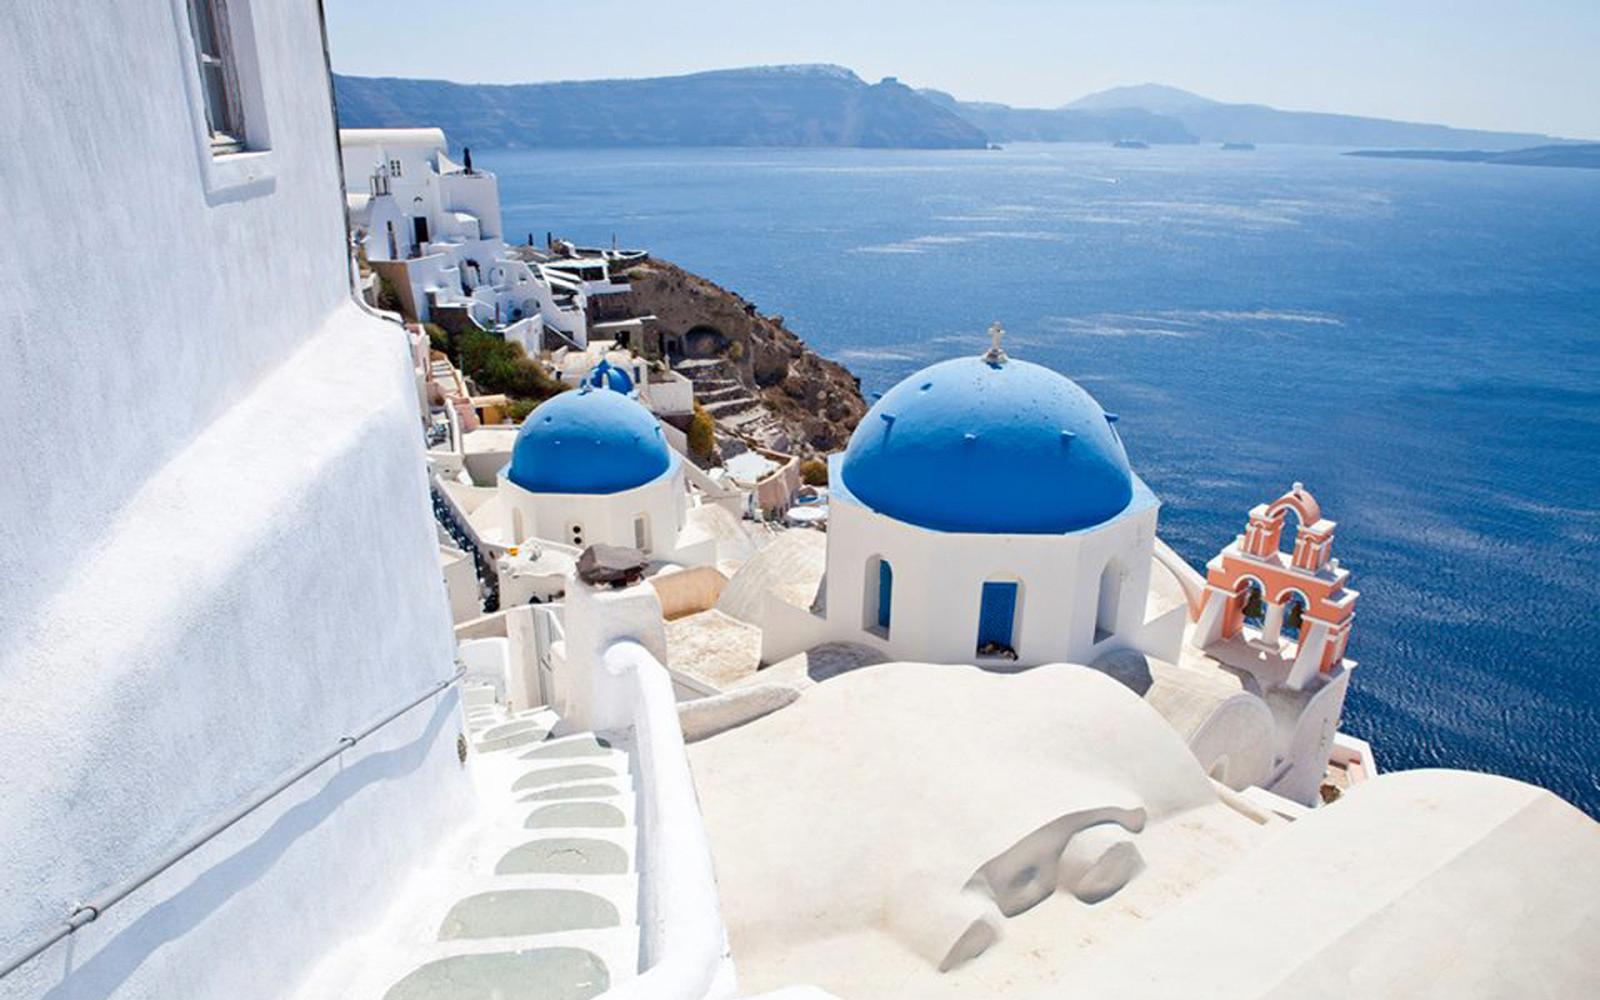 wallpaper santorini greece island - photo #4